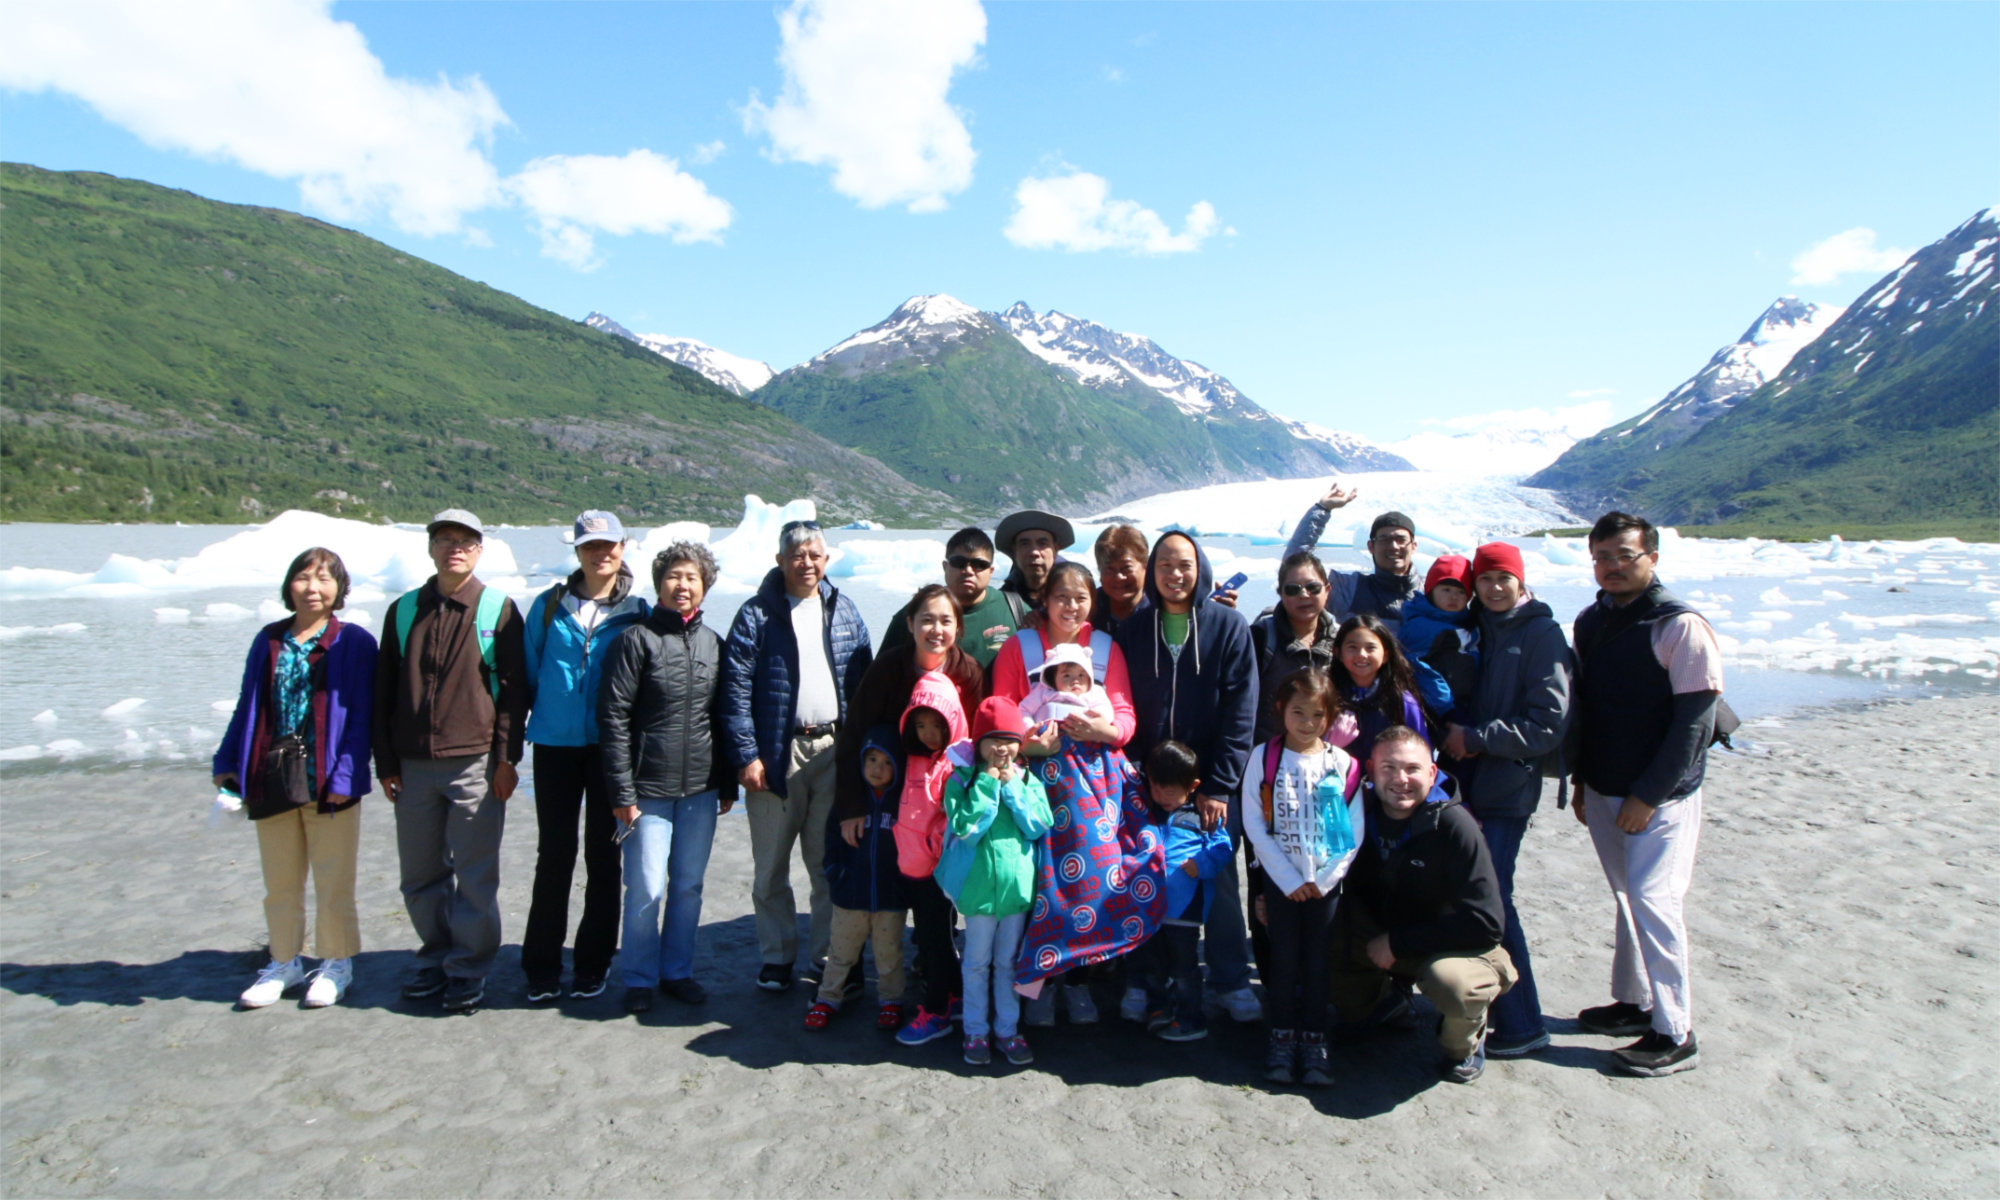 Alaska Vacation Photo